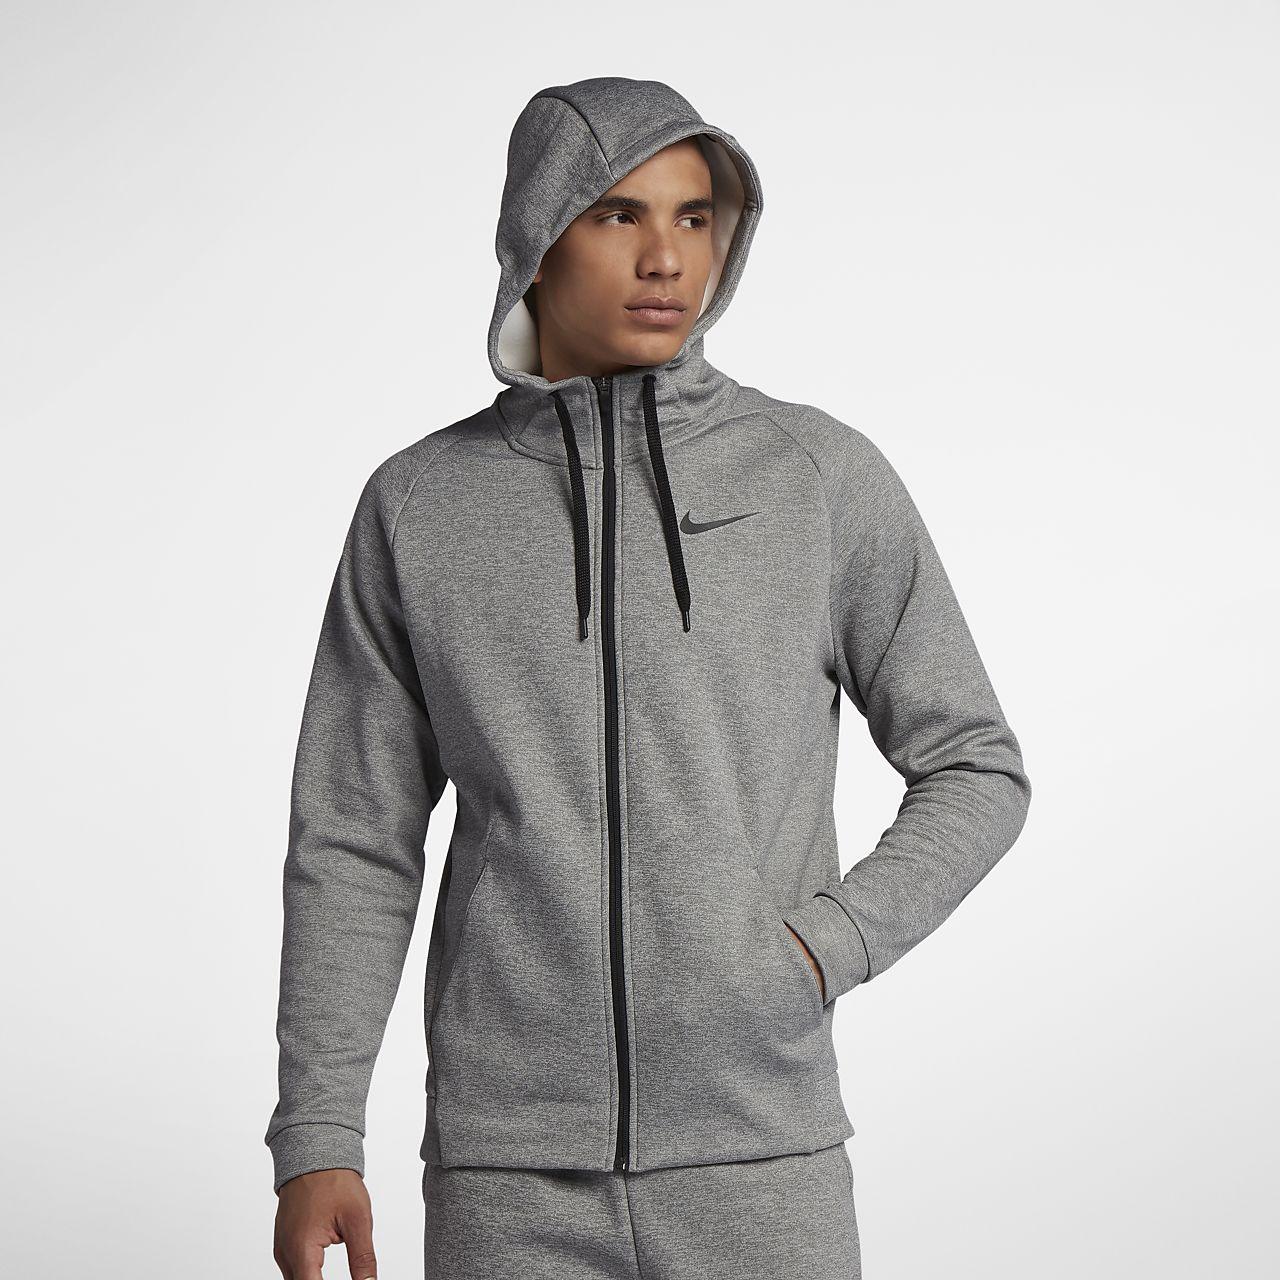 855d356dd Nike Dri-FIT Therma Men's Full-Zip Training Hoodie. Nike.com SE